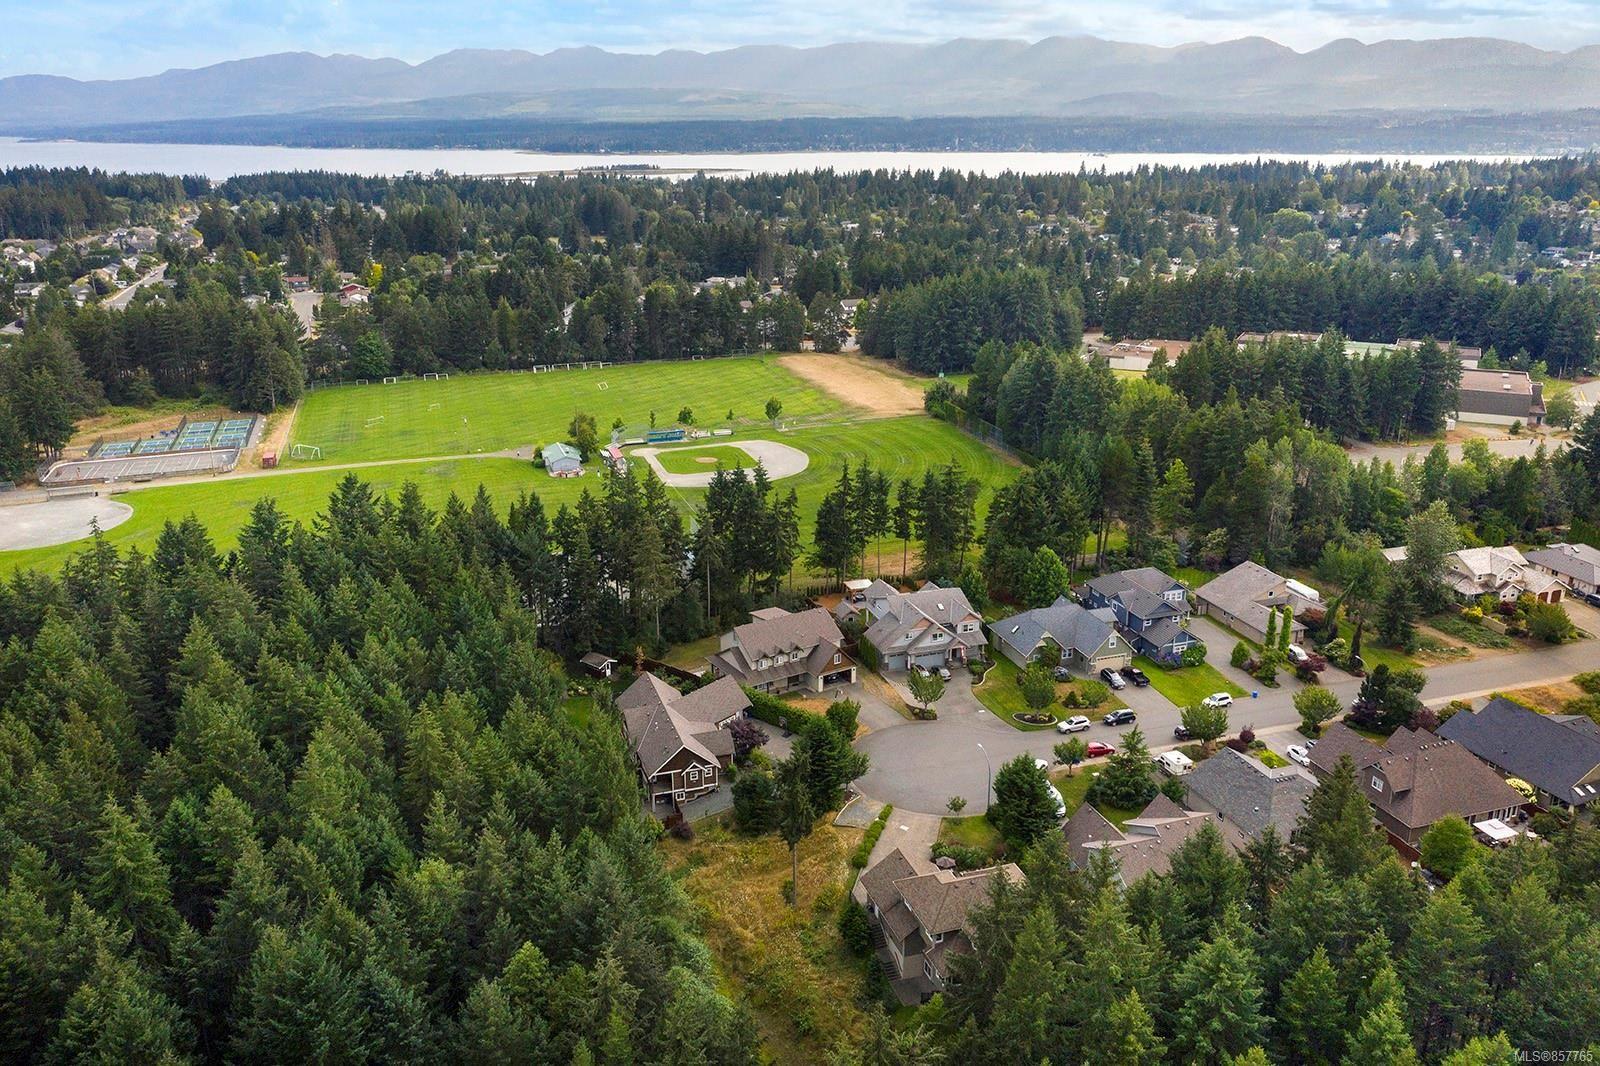 Photo 48: Photos: 1516 Highridge Dr in : CV Comox (Town of) House for sale (Comox Valley)  : MLS®# 857765